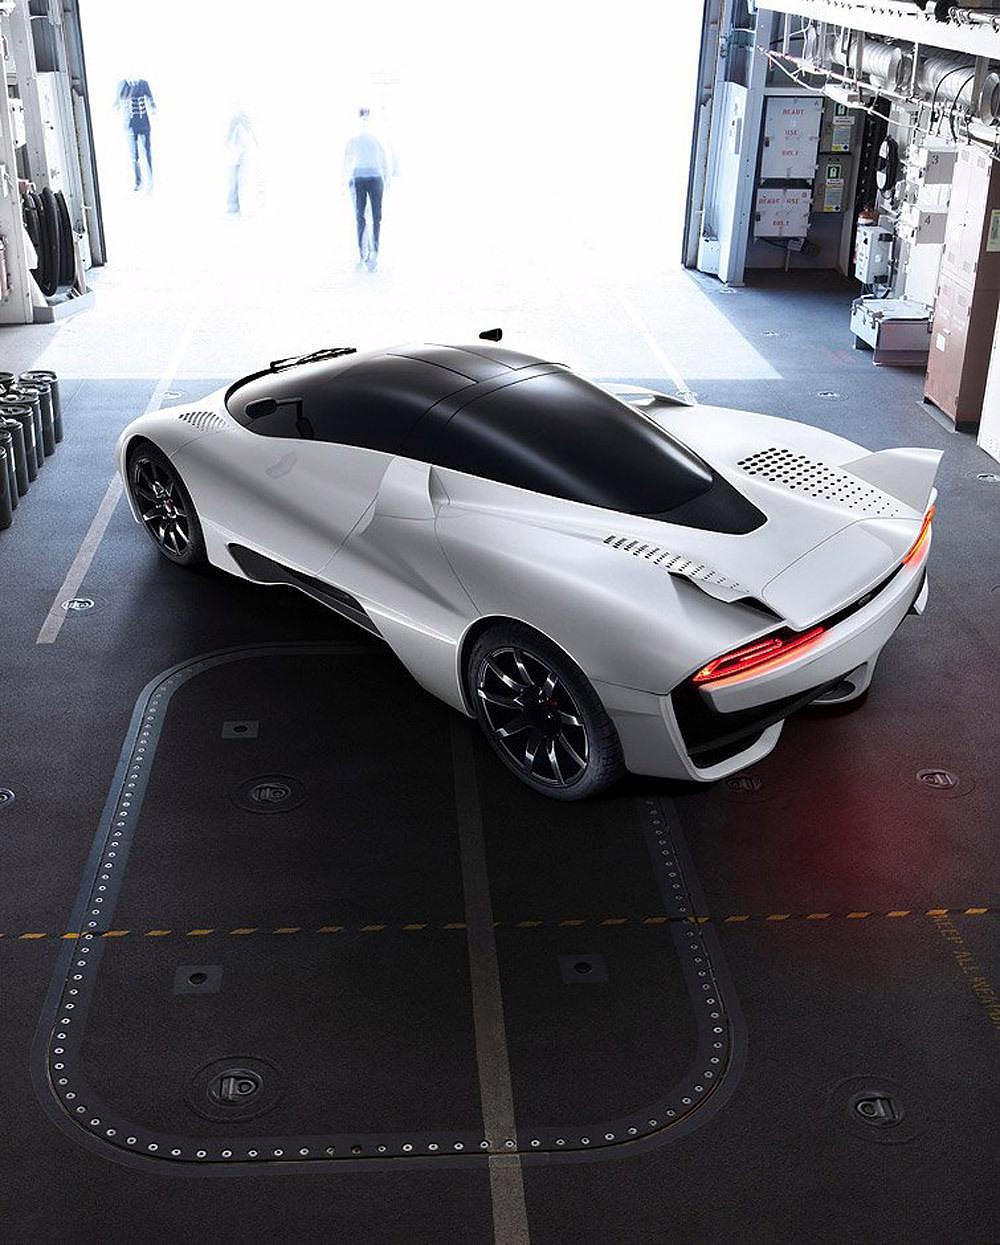 SSC Tuatara Aims To Be The World's Fastest Car.